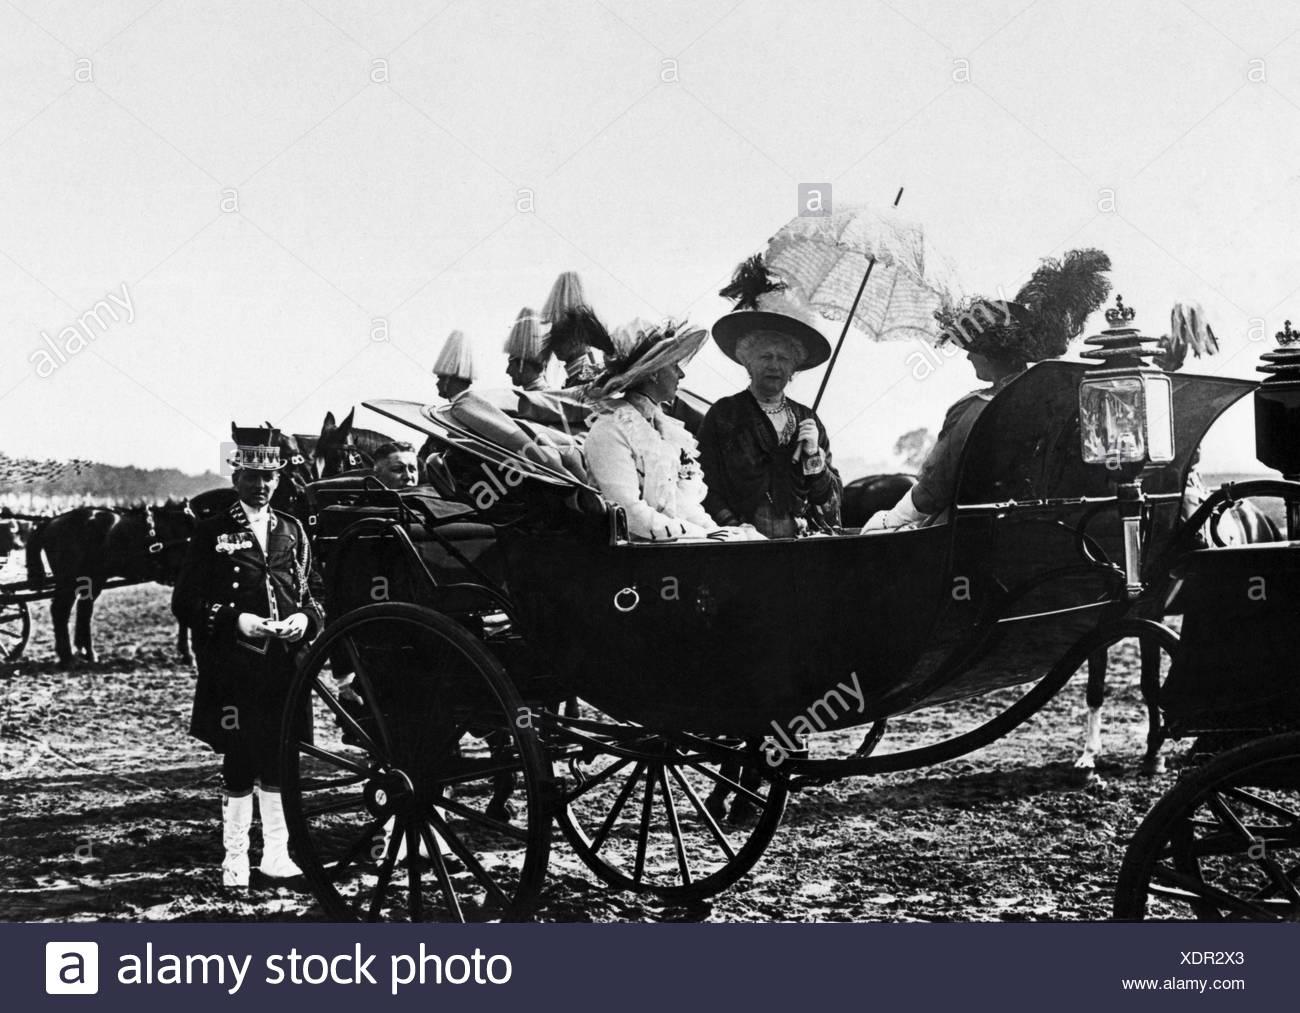 Augusta Victoria, 22.10.1858 - 11.4.1921, German Empress 15.6.1888 - 9.11.1918, with princesses Sophie Charlotte of Oldenburg an Stockbild